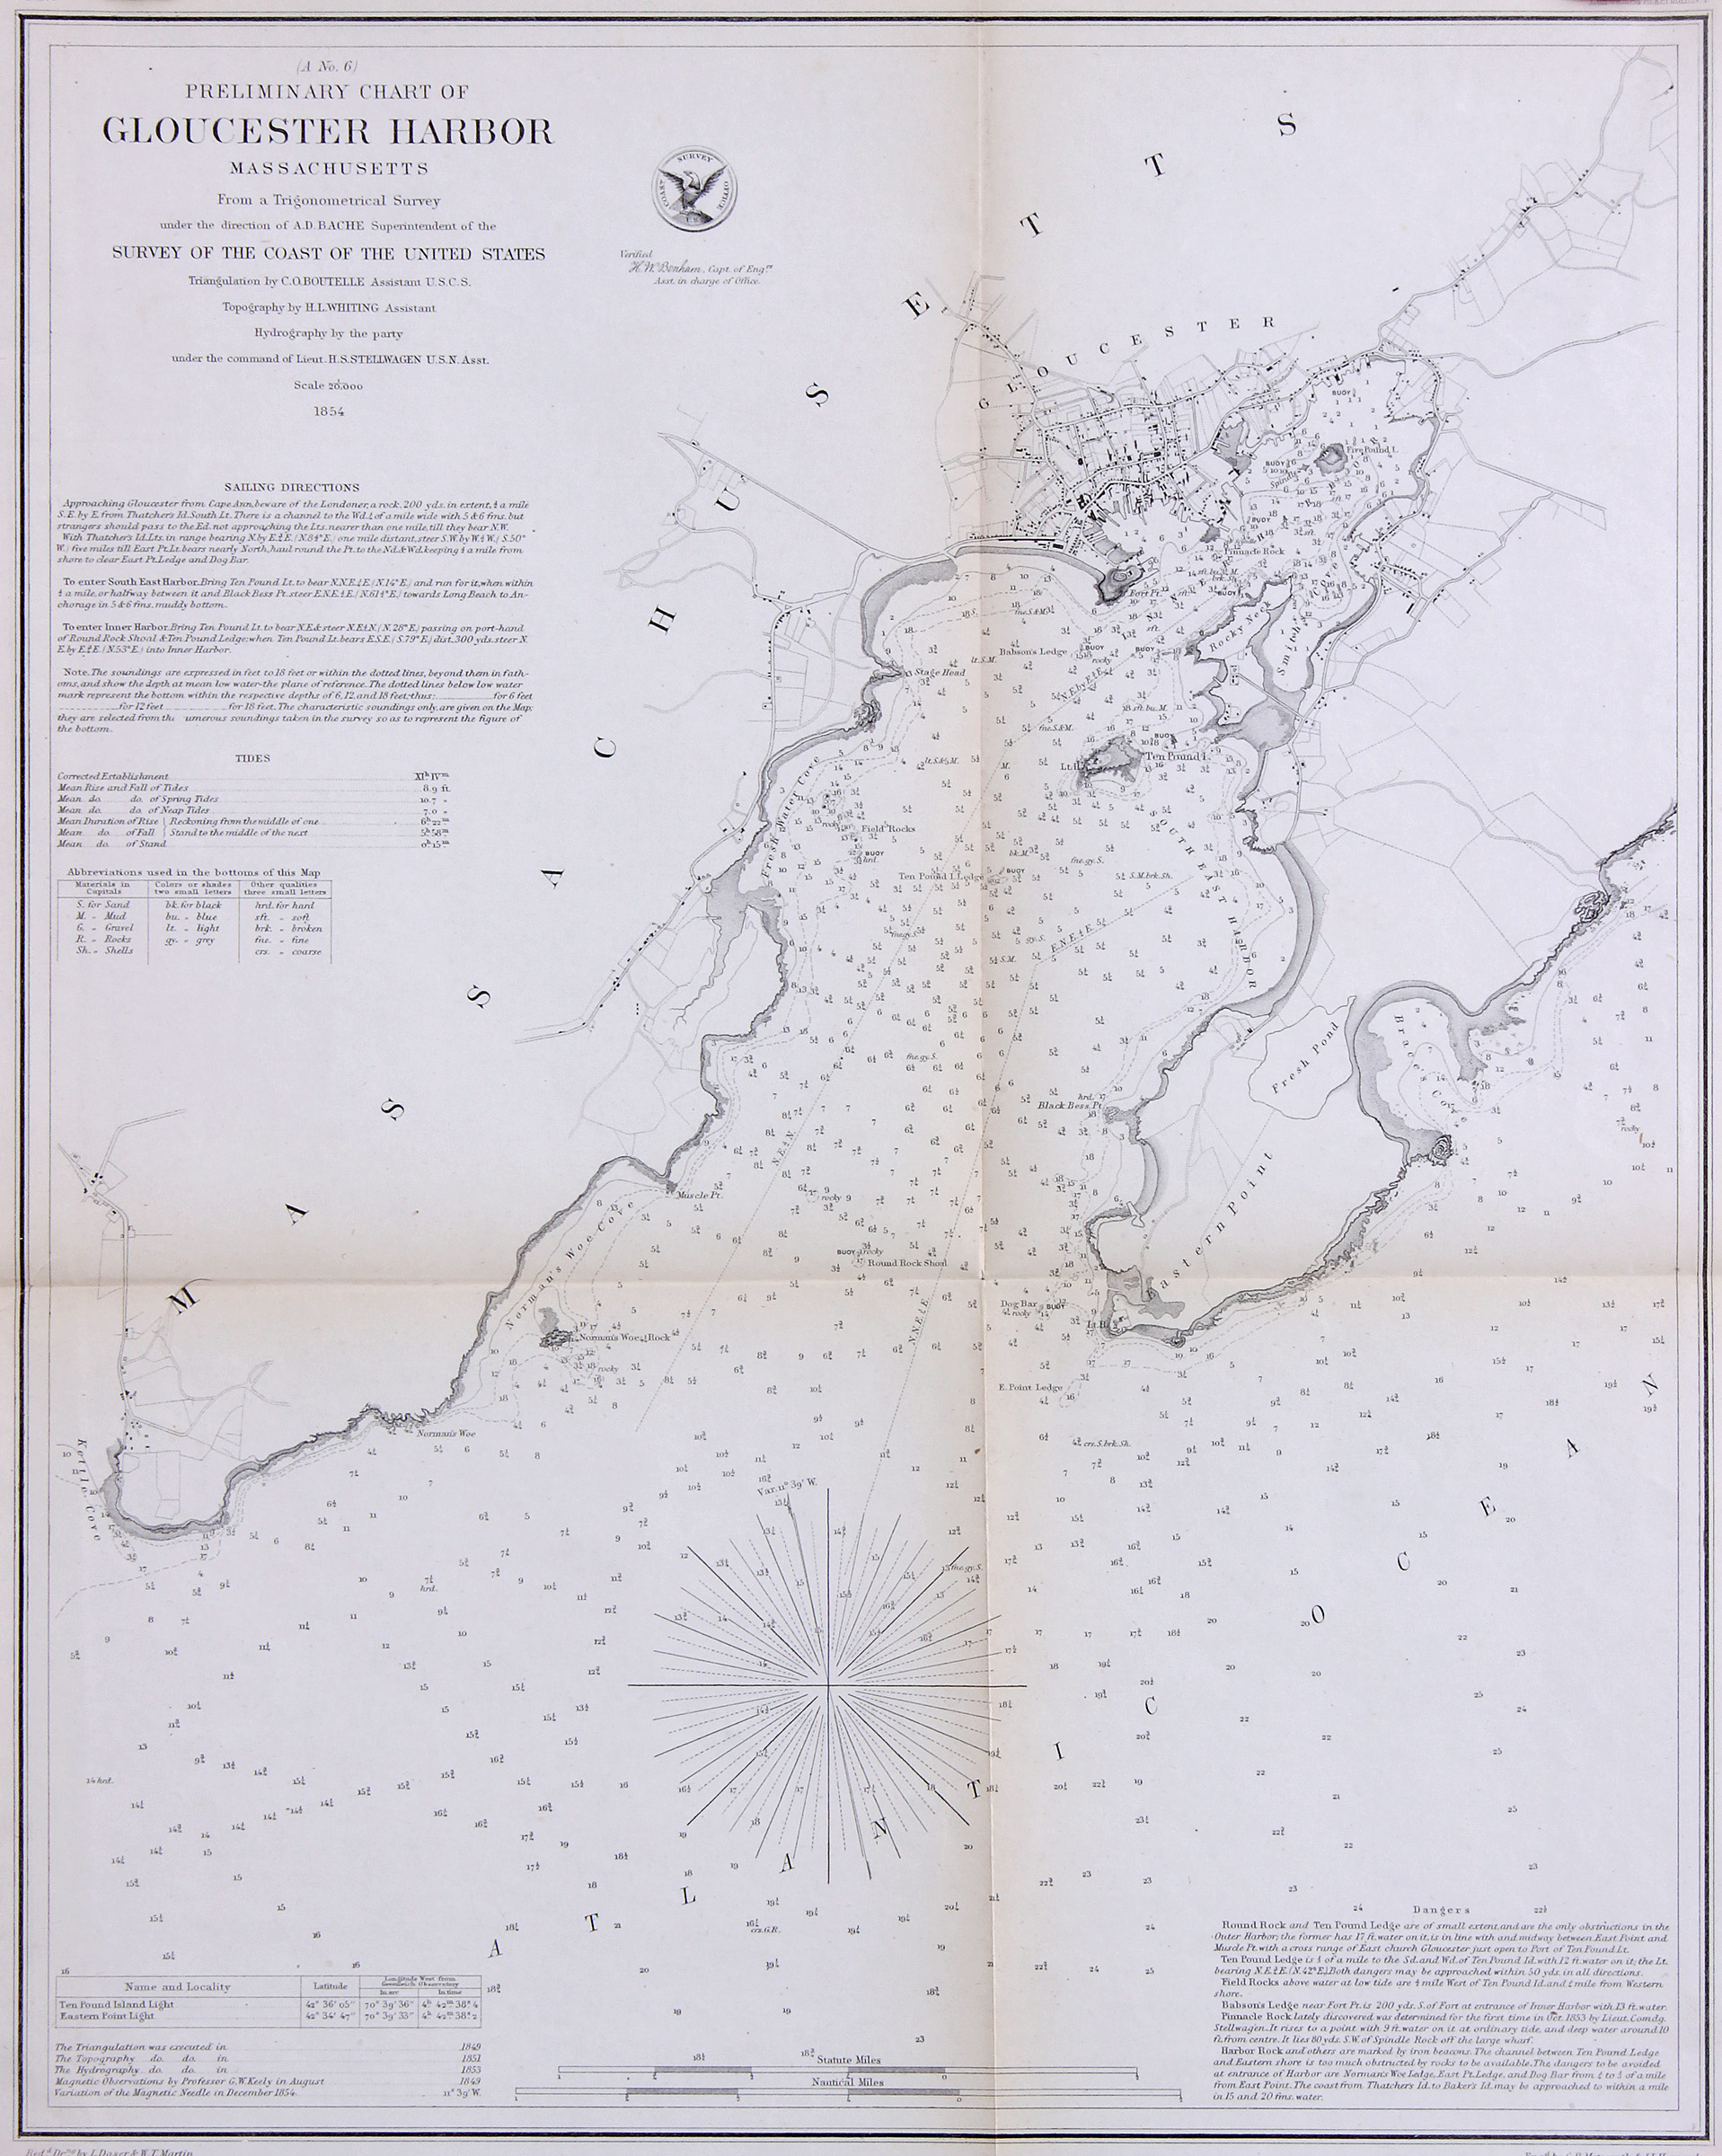 Fitz henry lane brig cadet in gloucester harbor late 1840s map nvjuhfo Choice Image